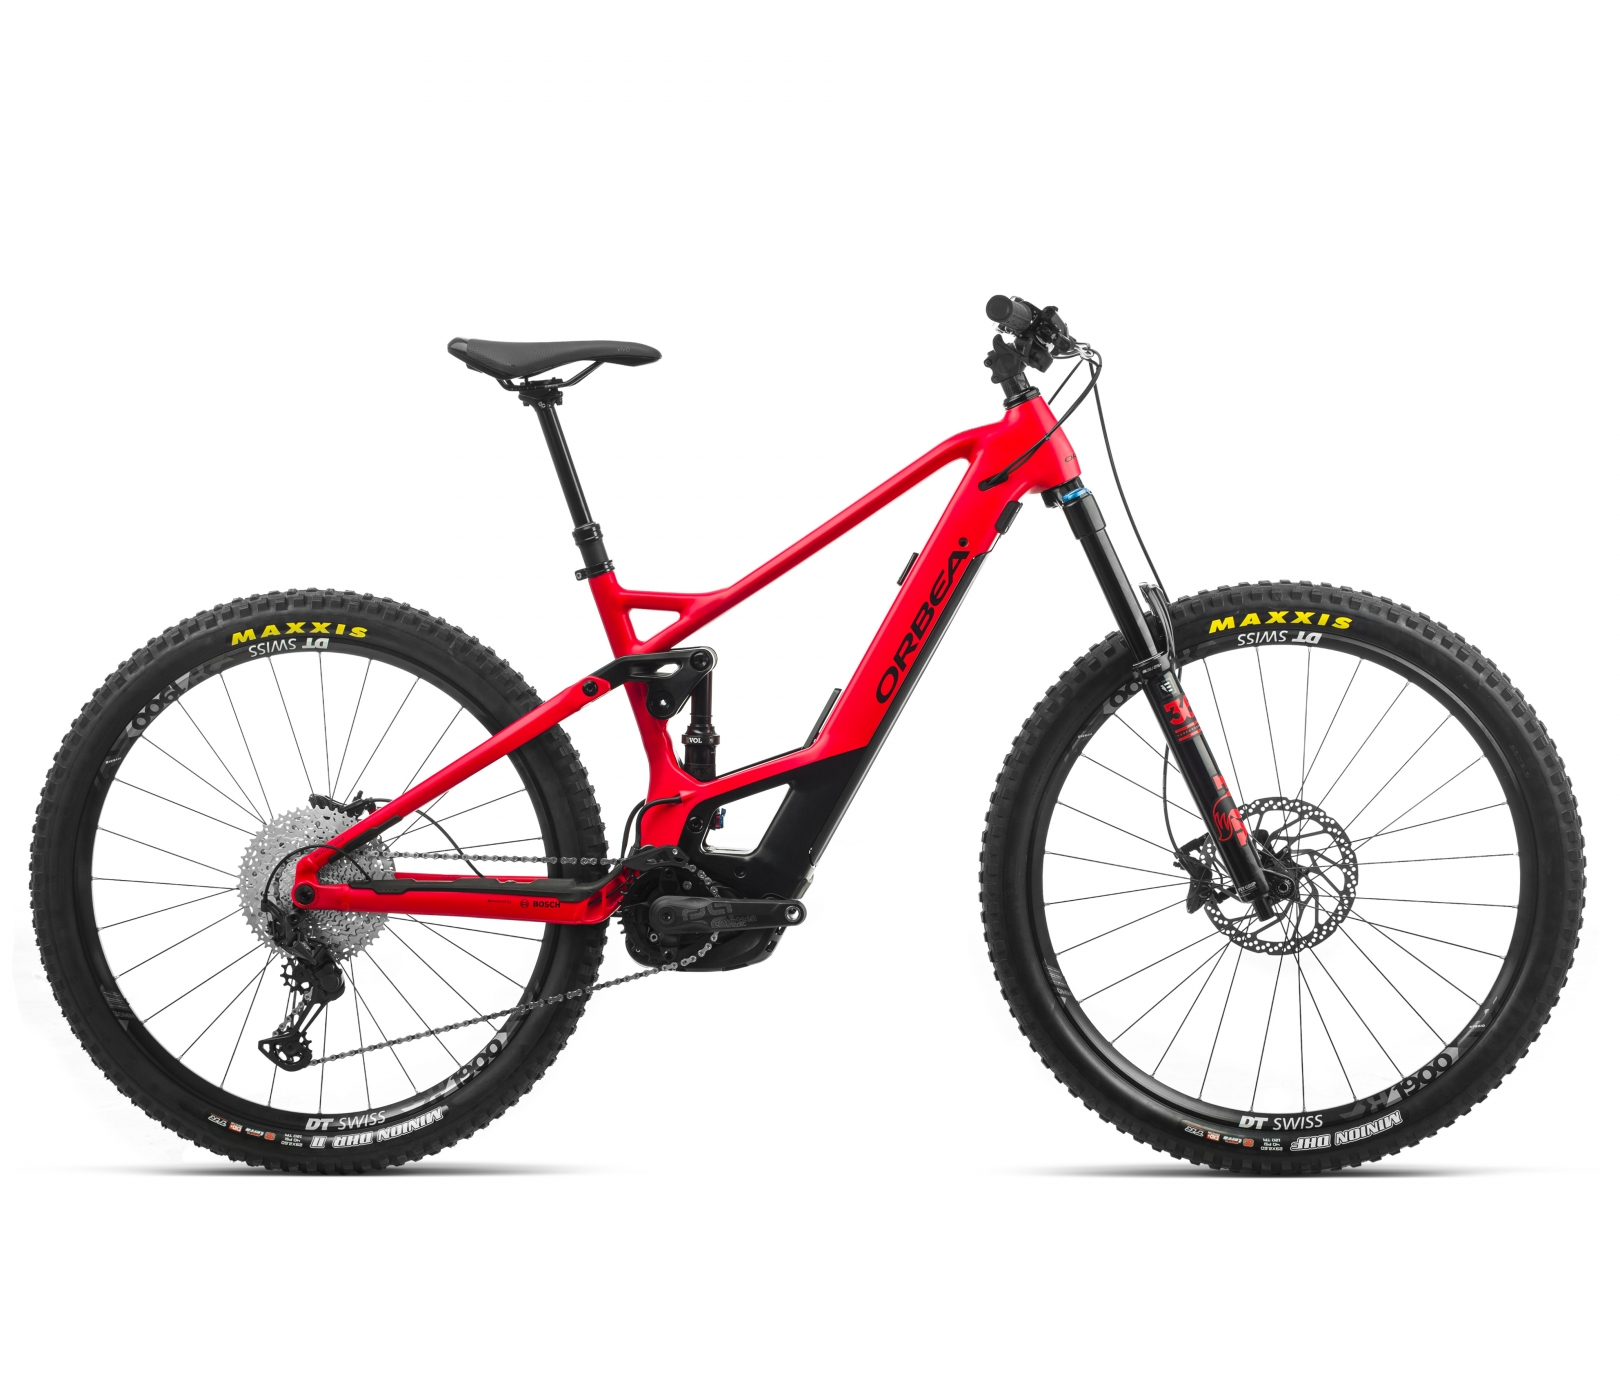 ORBEA WILD FS H15 eBike - BRIGHTRED /ZWART (DOF) @G-Bikes